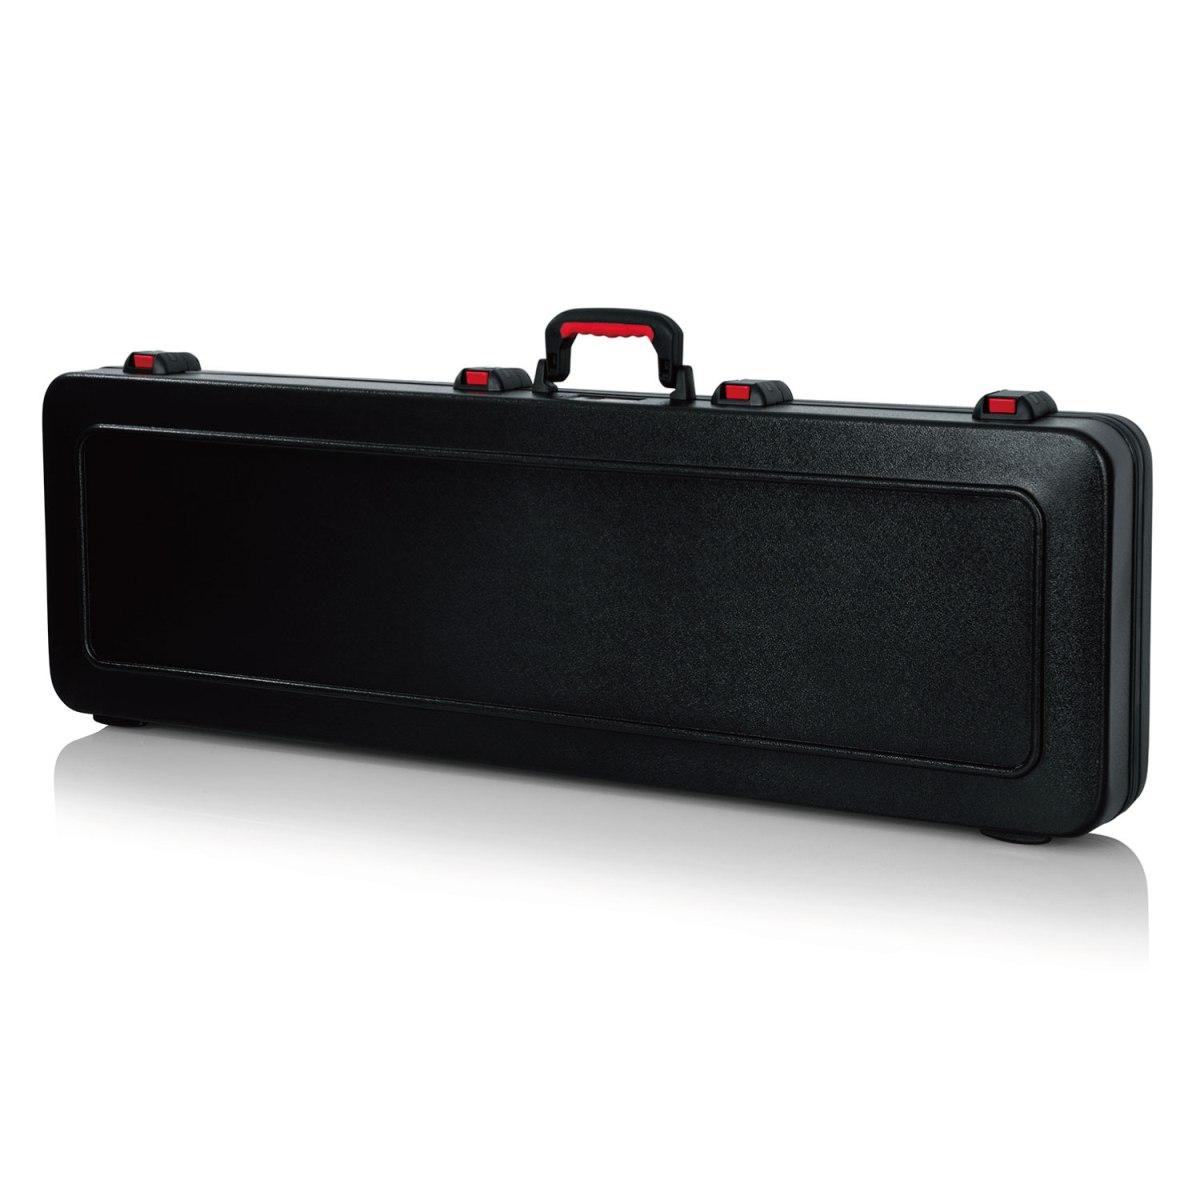 GATOR ゲーター / GTSA-GTRBASS (エレキベース用ハードケース)【お取り寄せ商品】【WEBSHOP】